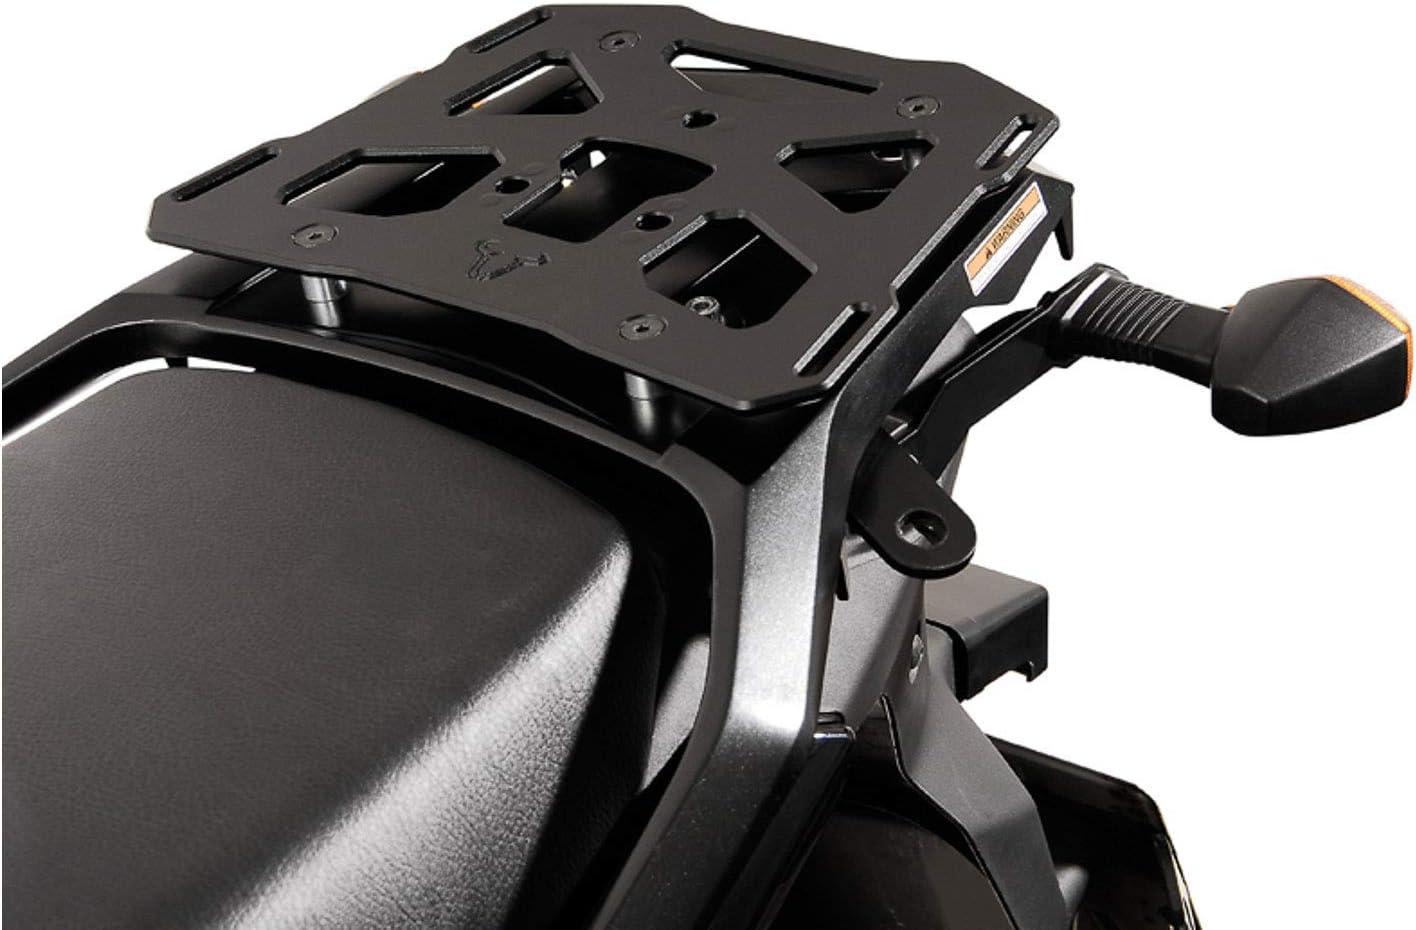 SW-MOTECH ALU-RACK Top Rack To Fit Many Top Case Styles for Suzuki DL650 V-Strom 04-11 /& DL1000 V-Strom 02-13